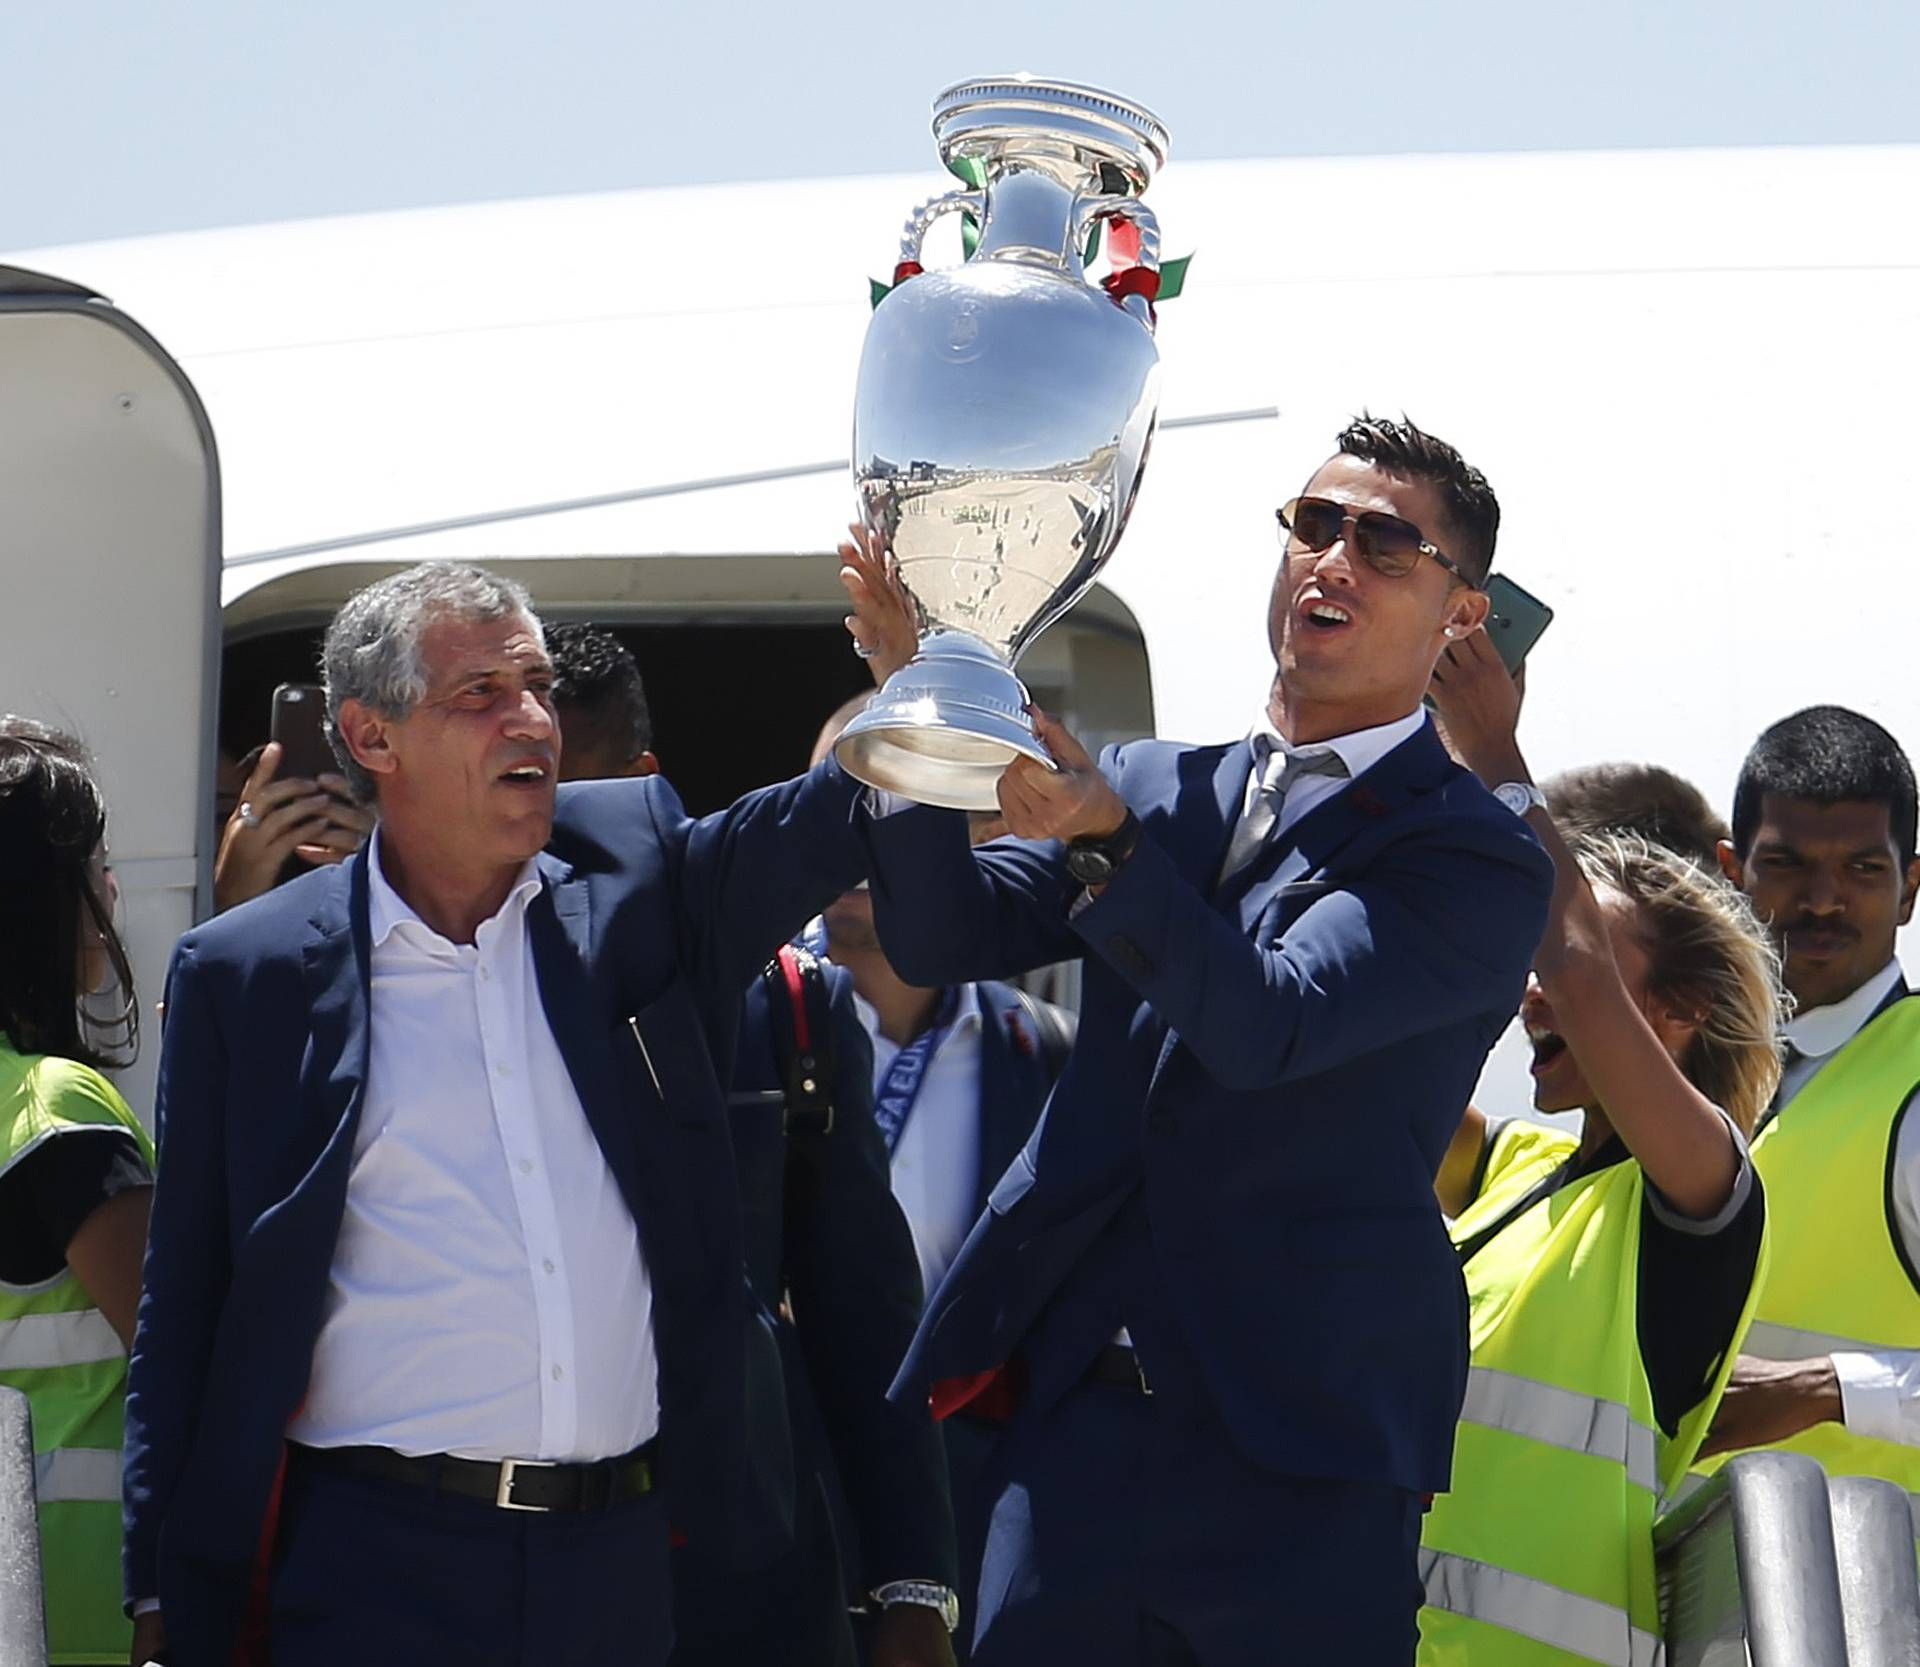 Santos and Ronaldo with Cup on return to Lisbon